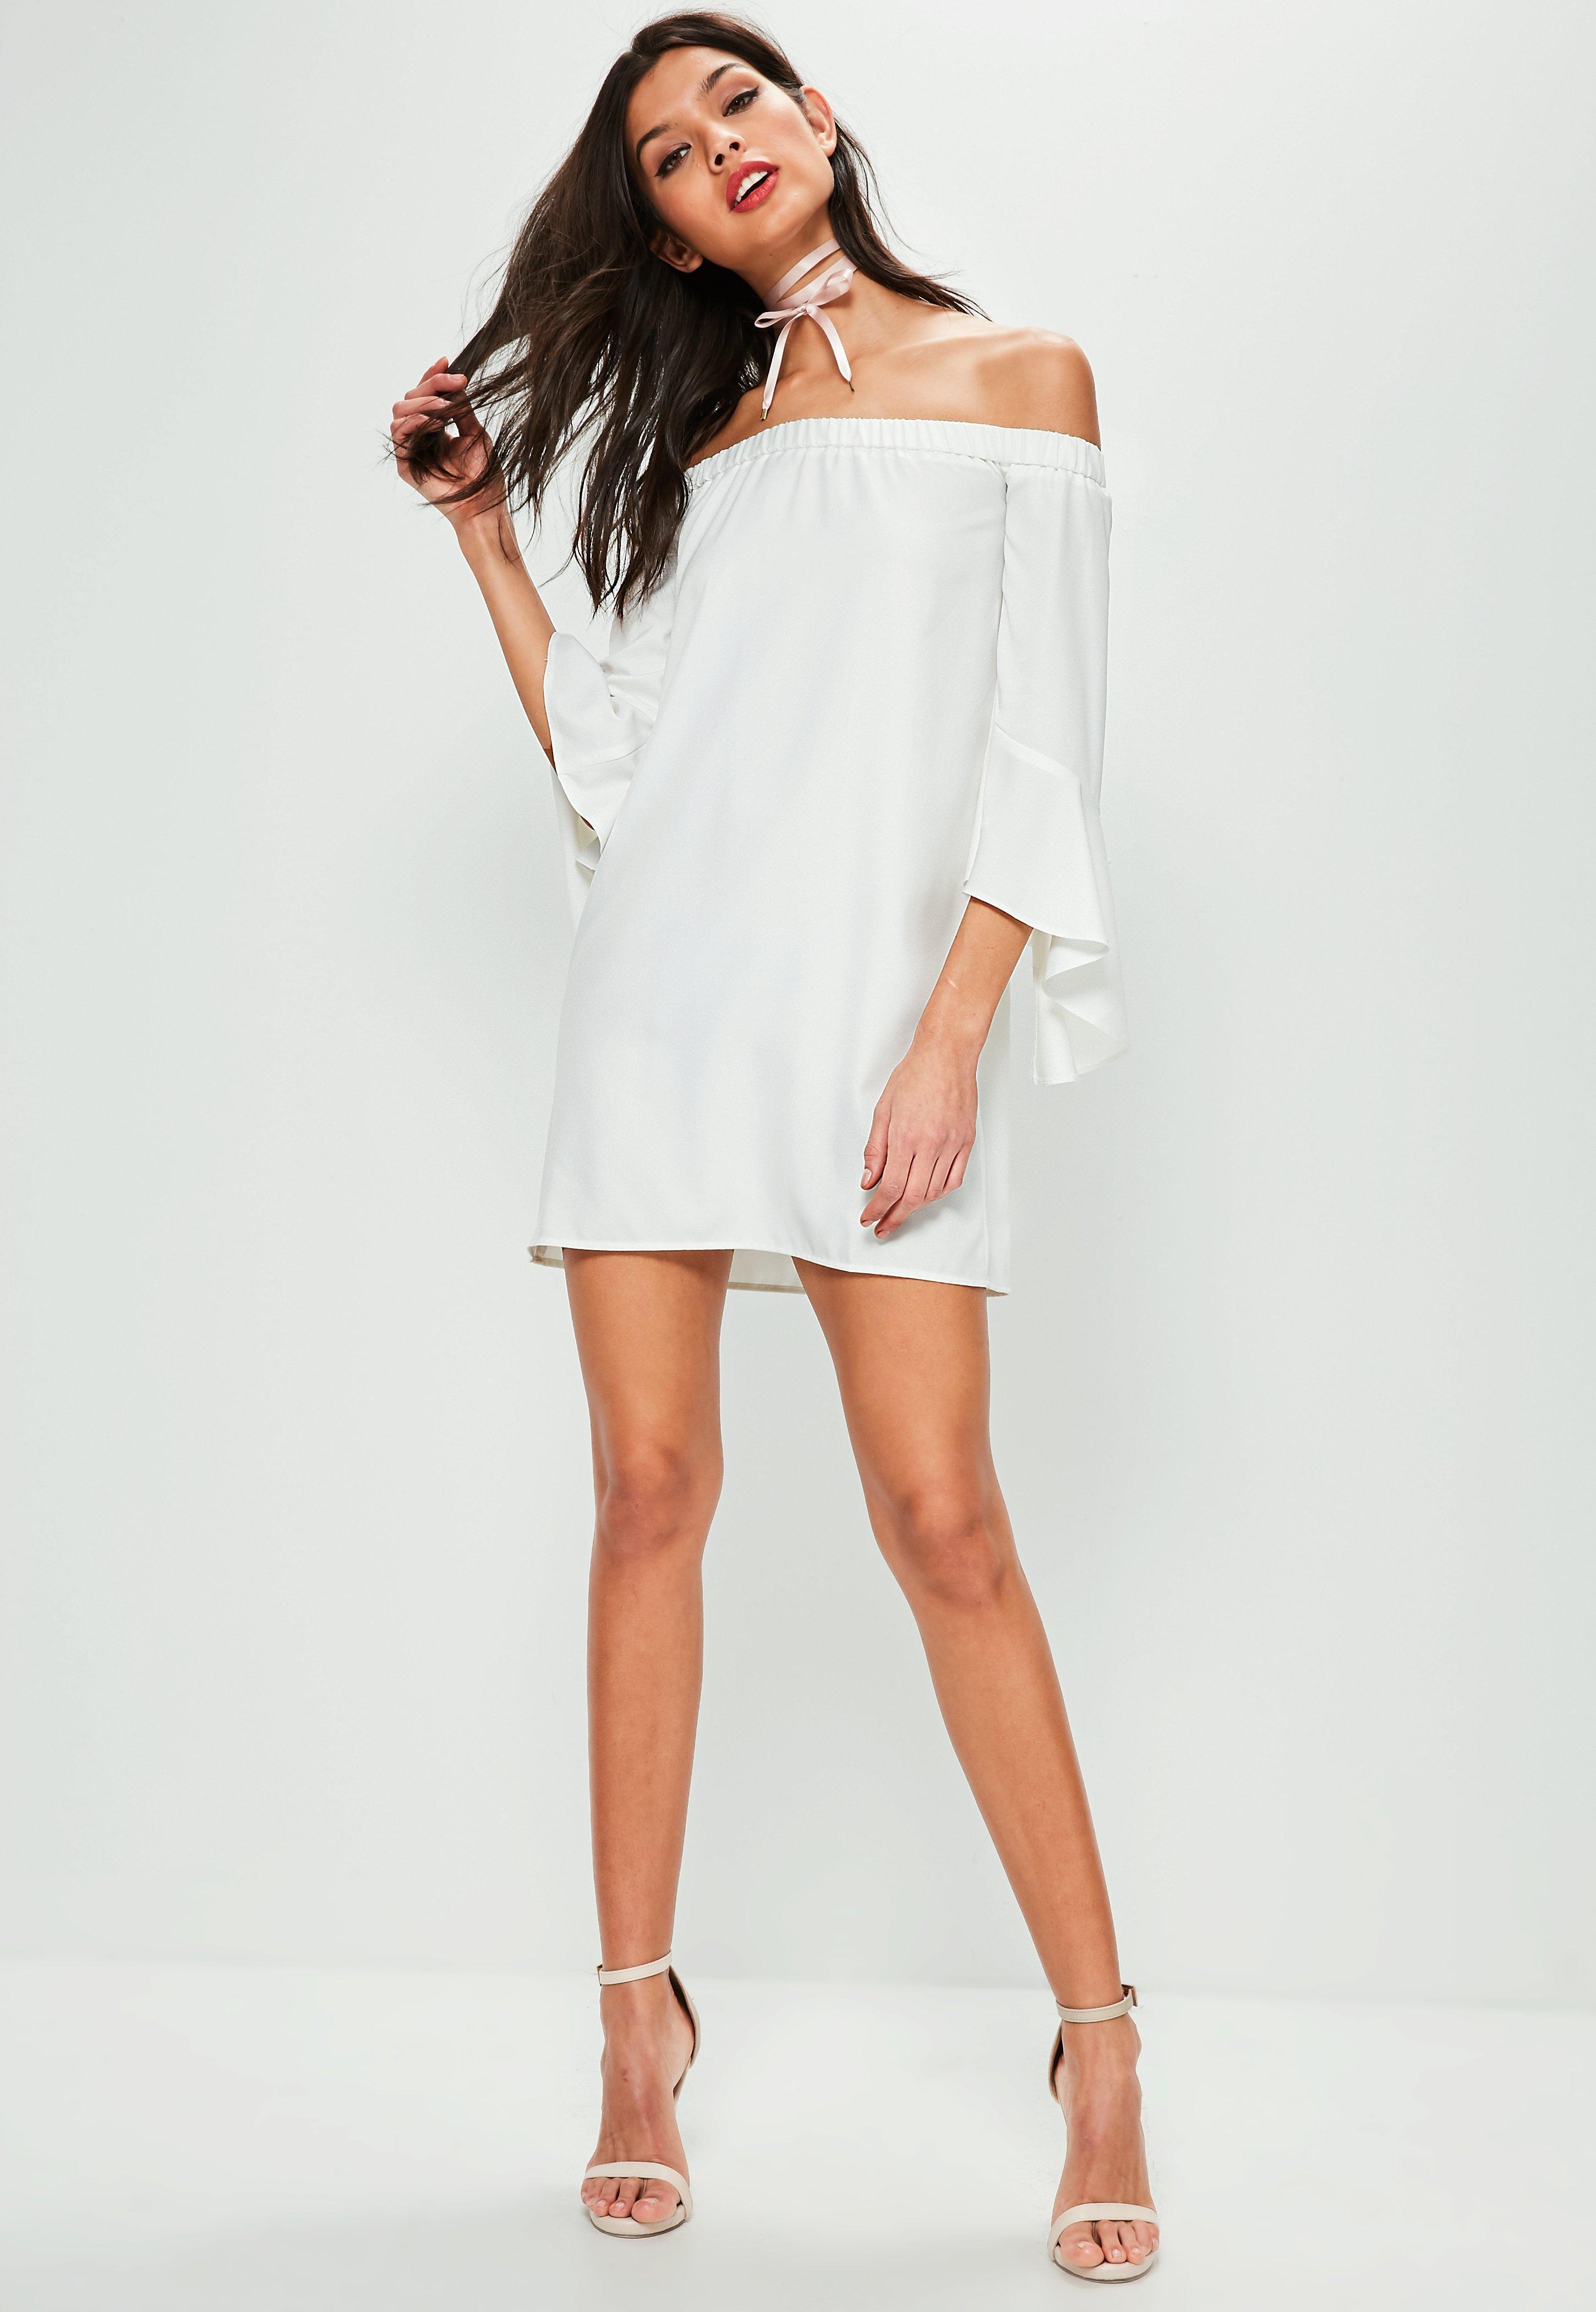 c09a7c6eca49 Lyst - Missguided Petite White Bardot Ruffle Sleeve Shift Dress in White